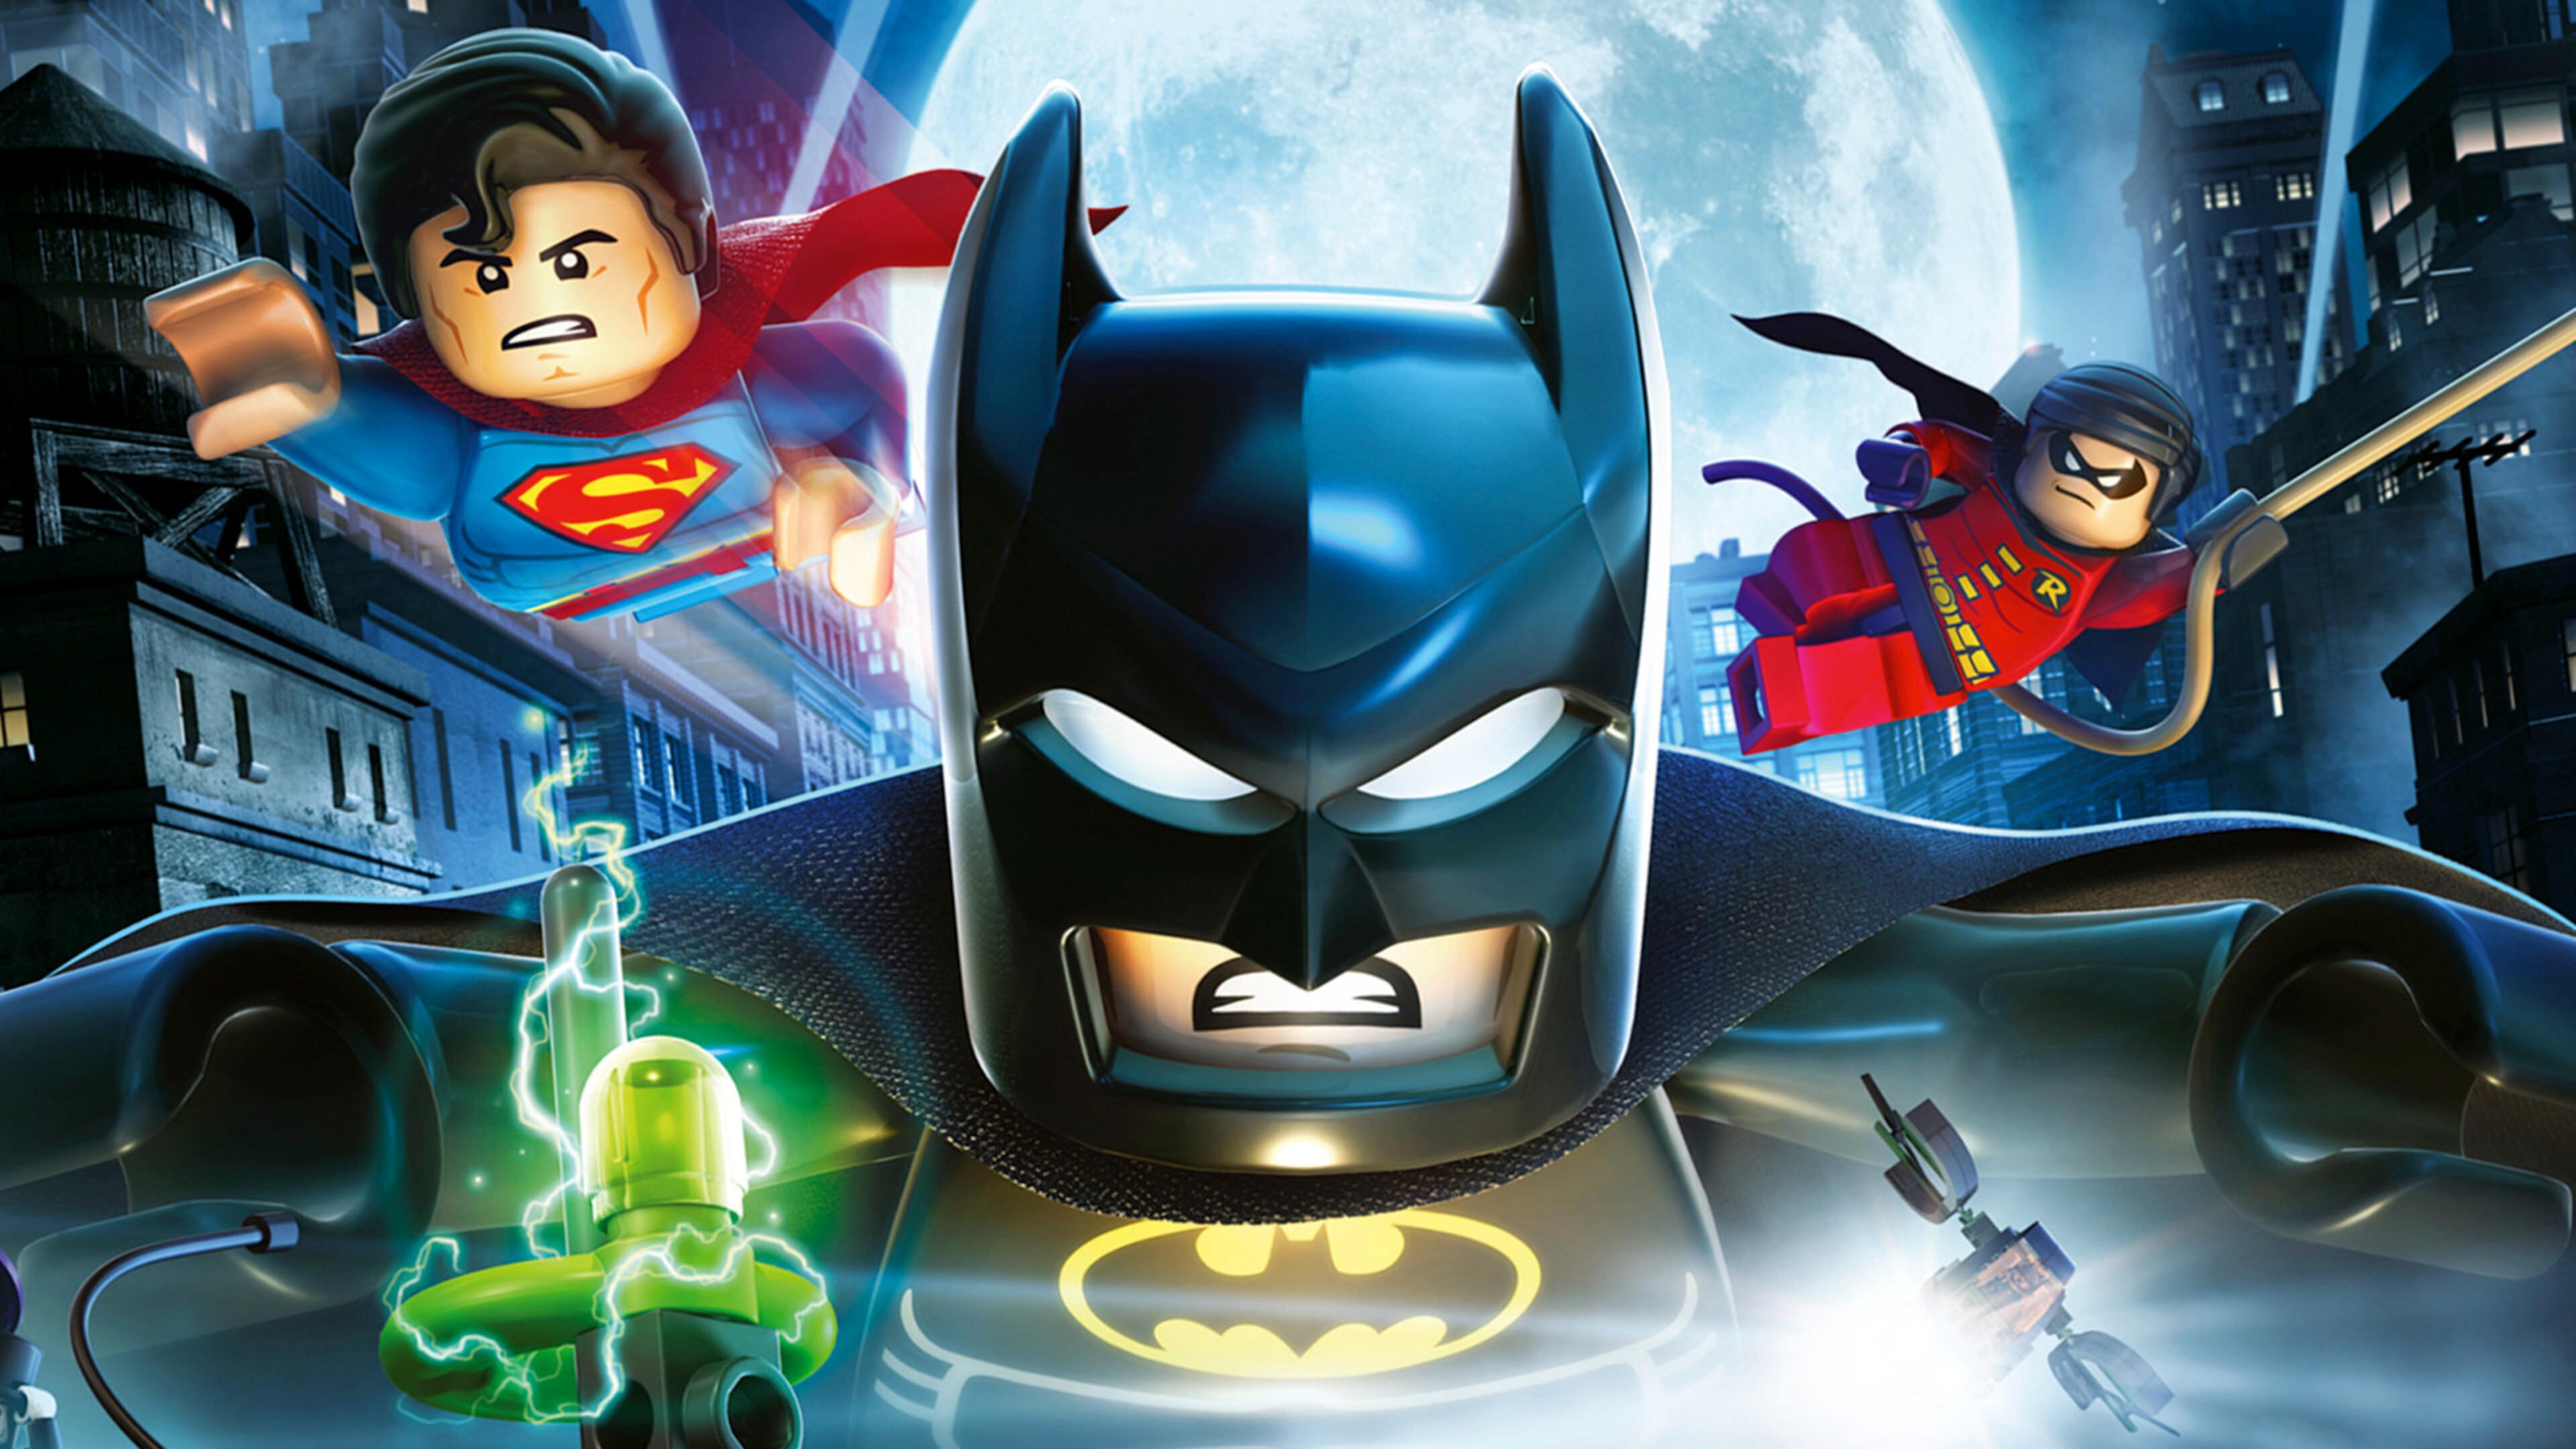 3840x2160 The Lego Batman Superman And Robin 4k HD 4k ...